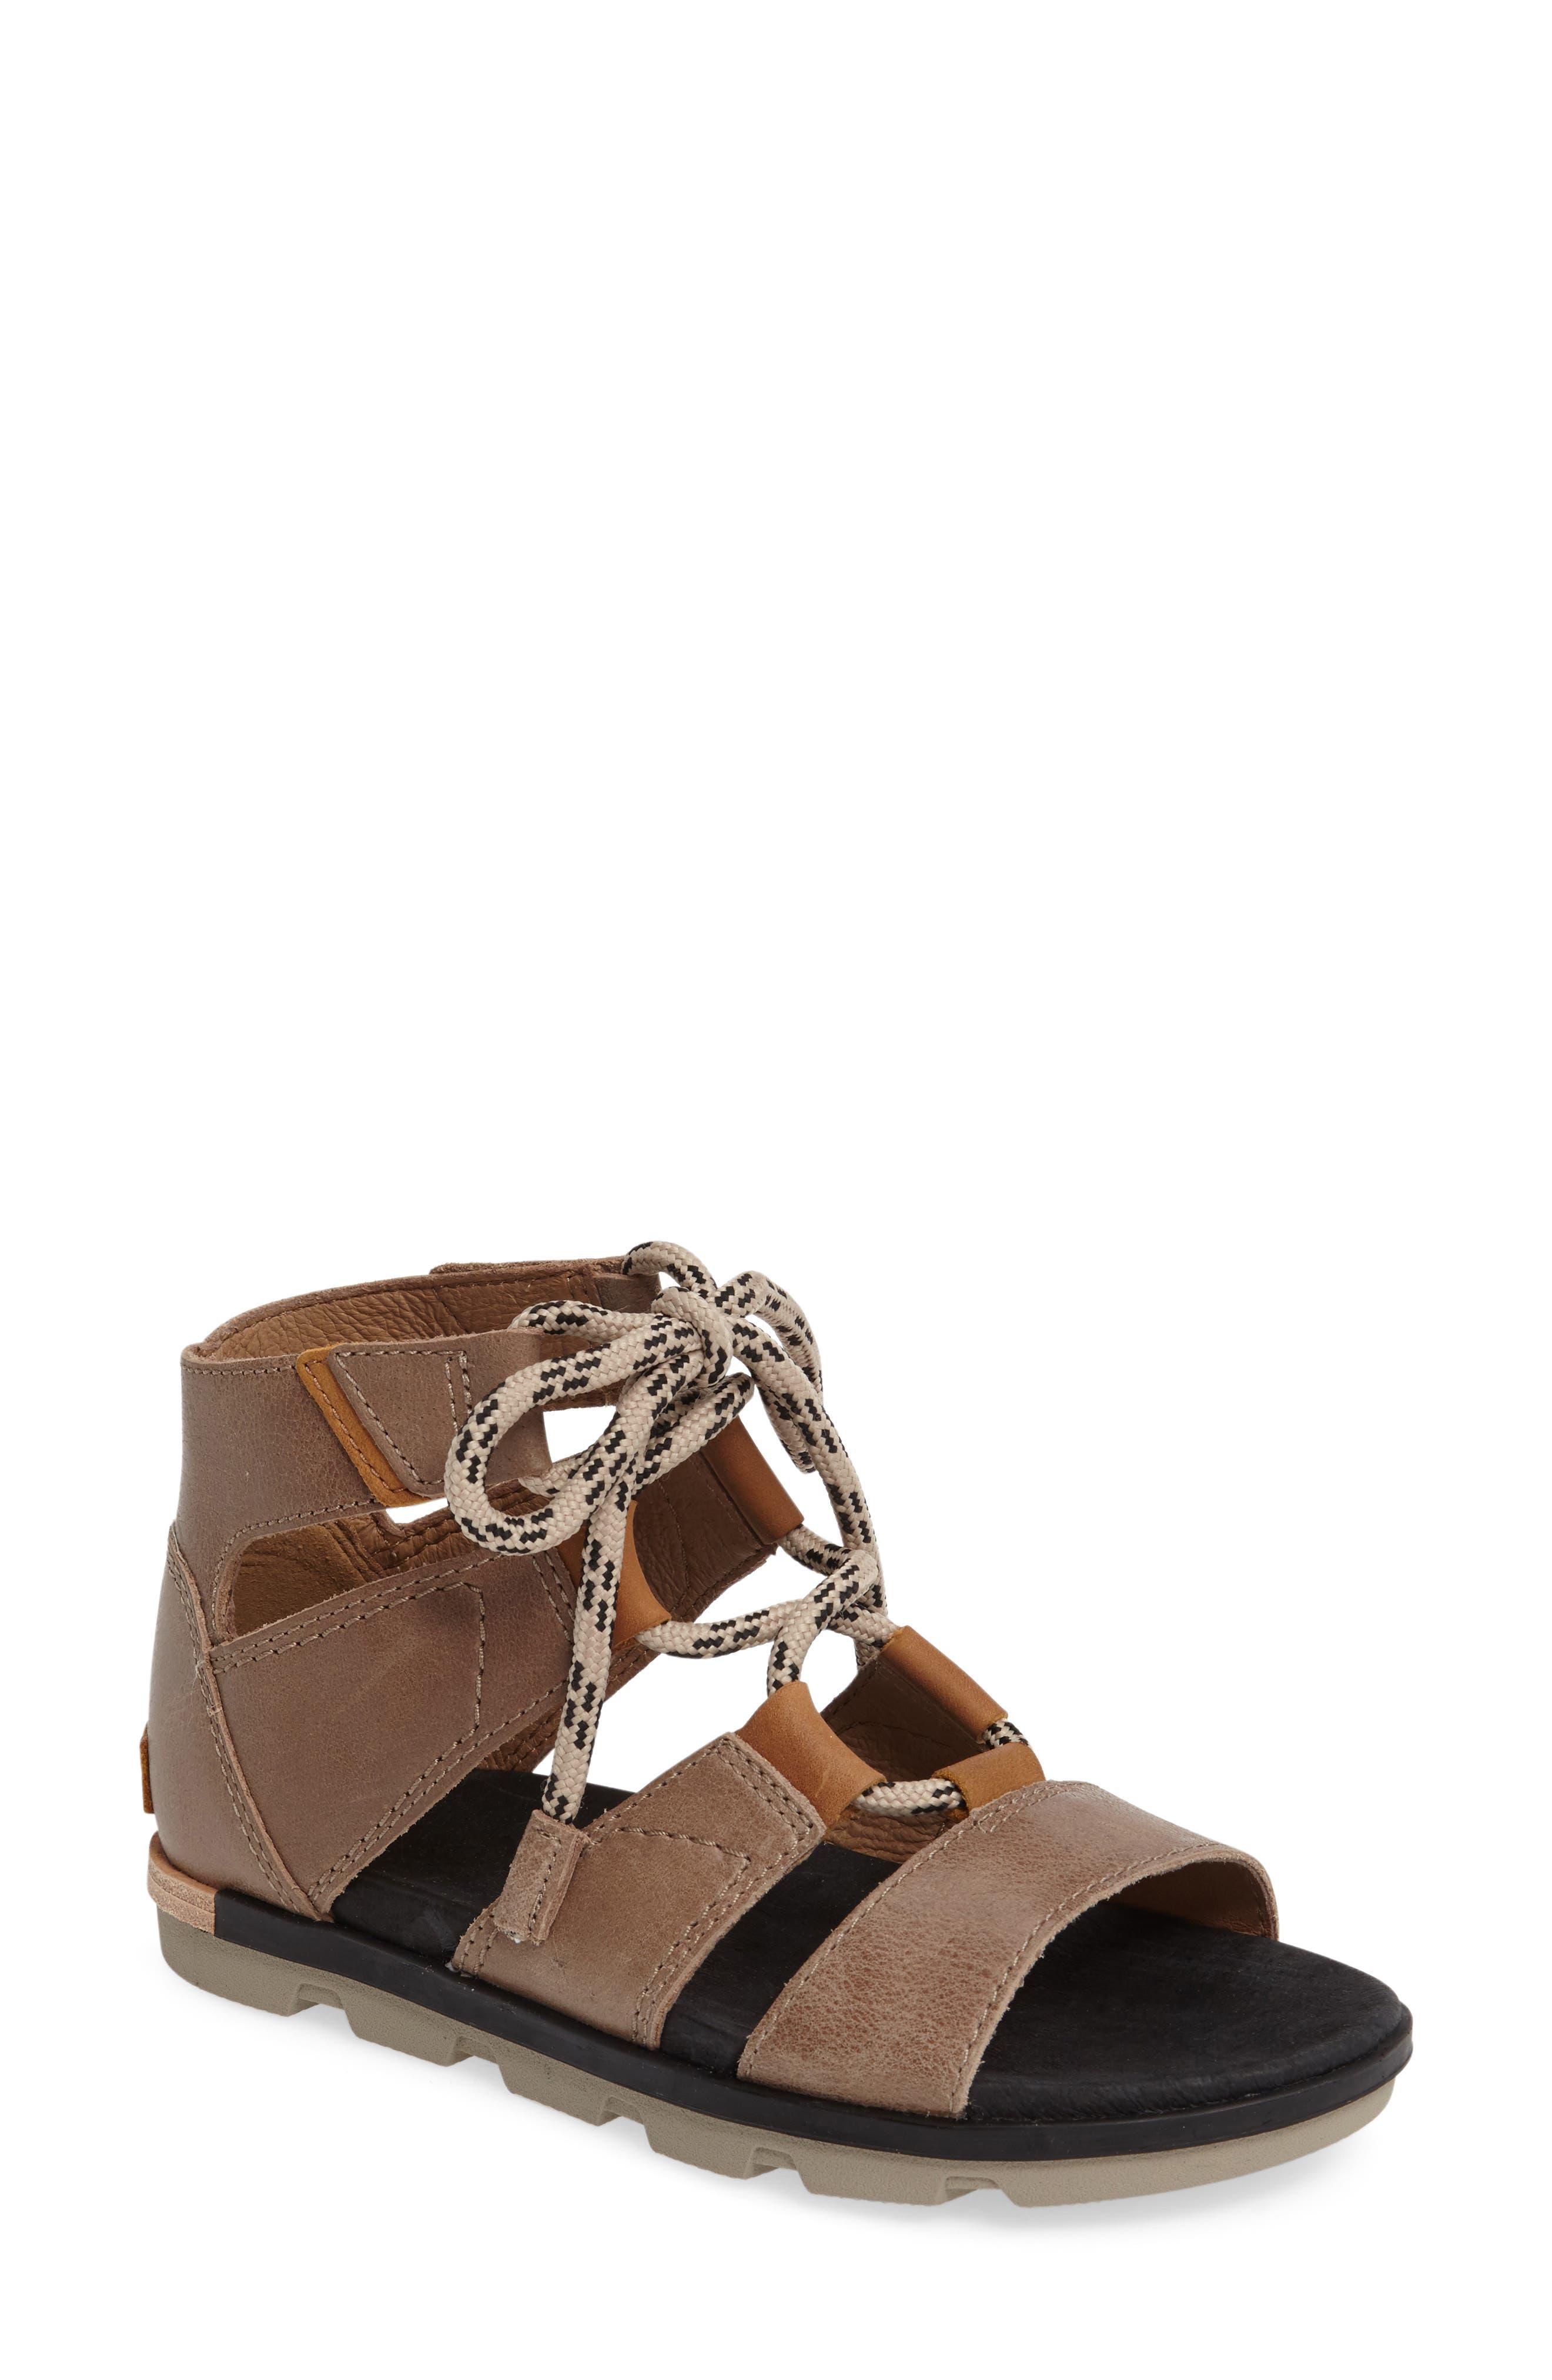 Alternate Image 1 Selected - SOREL 'Torpeda' Lace-Up Sandal (Women)